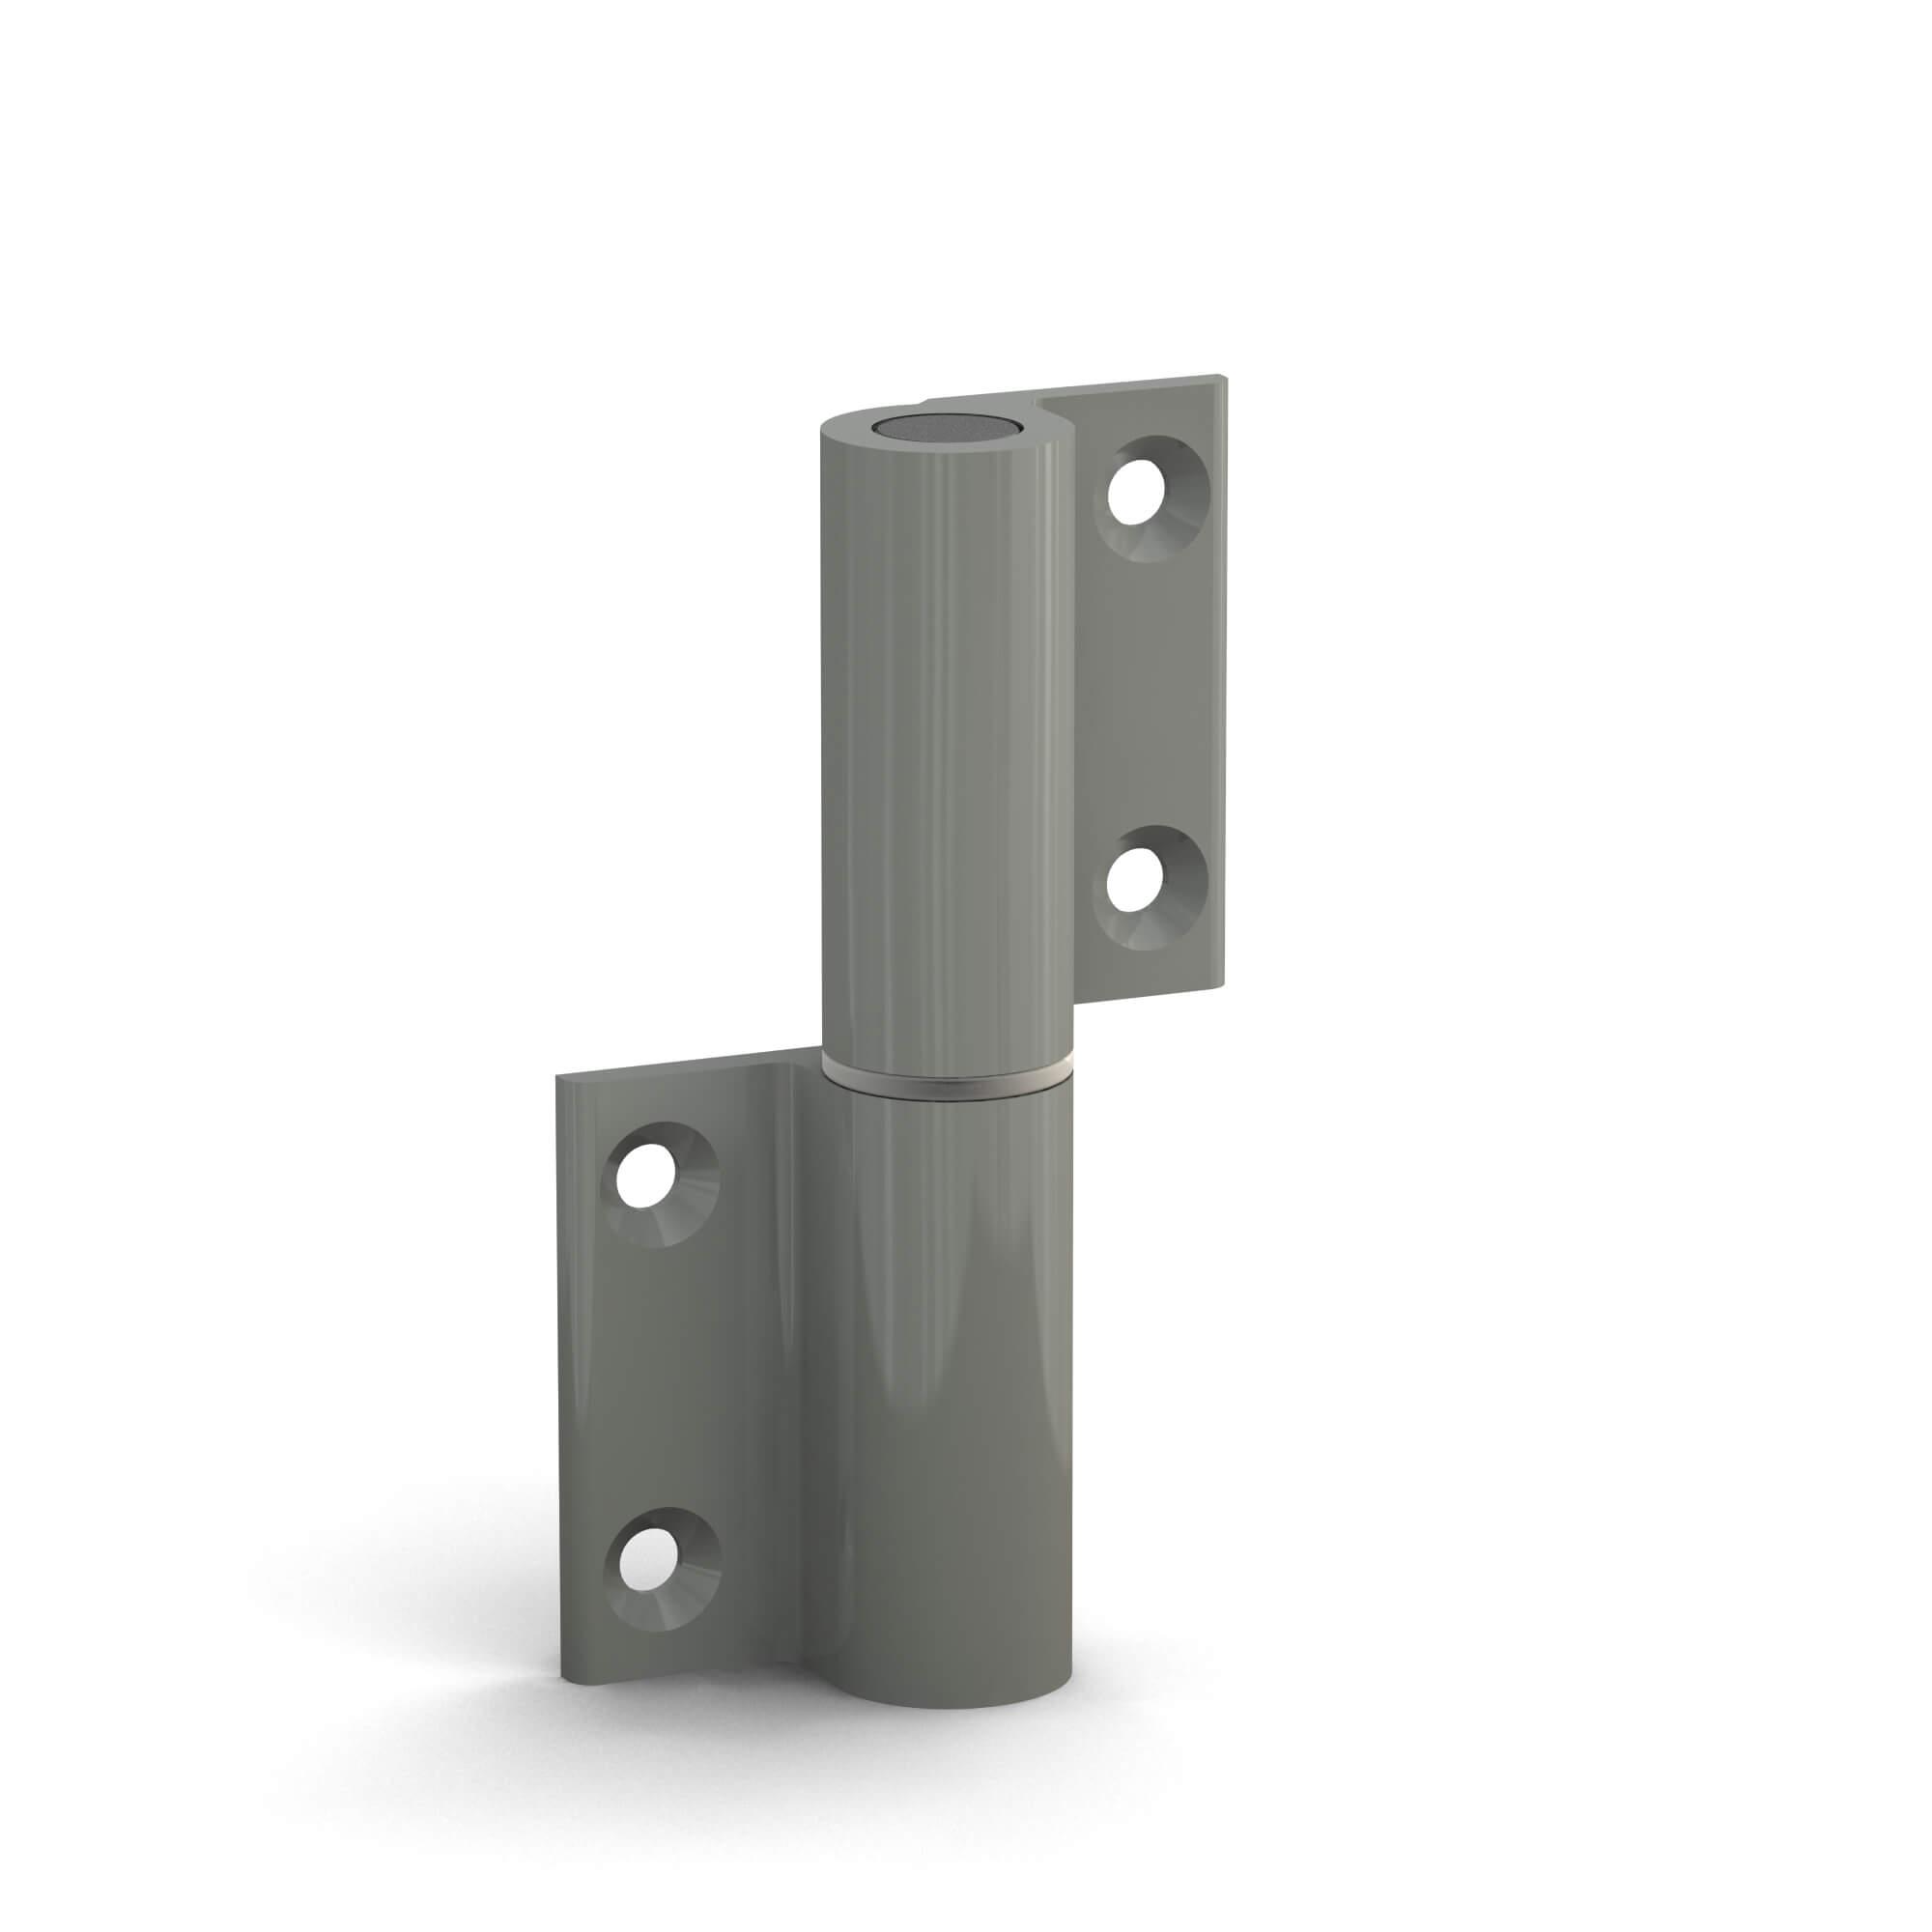 BUNT & PFIFFIG Doppelpack Möbelband Möbelscharnier Aufschraubband Türscharnier aus Aluminium Grau Achatgrau Hellgrau RAL 7038 DIN-Richtung: Links - aufschraubbar-1